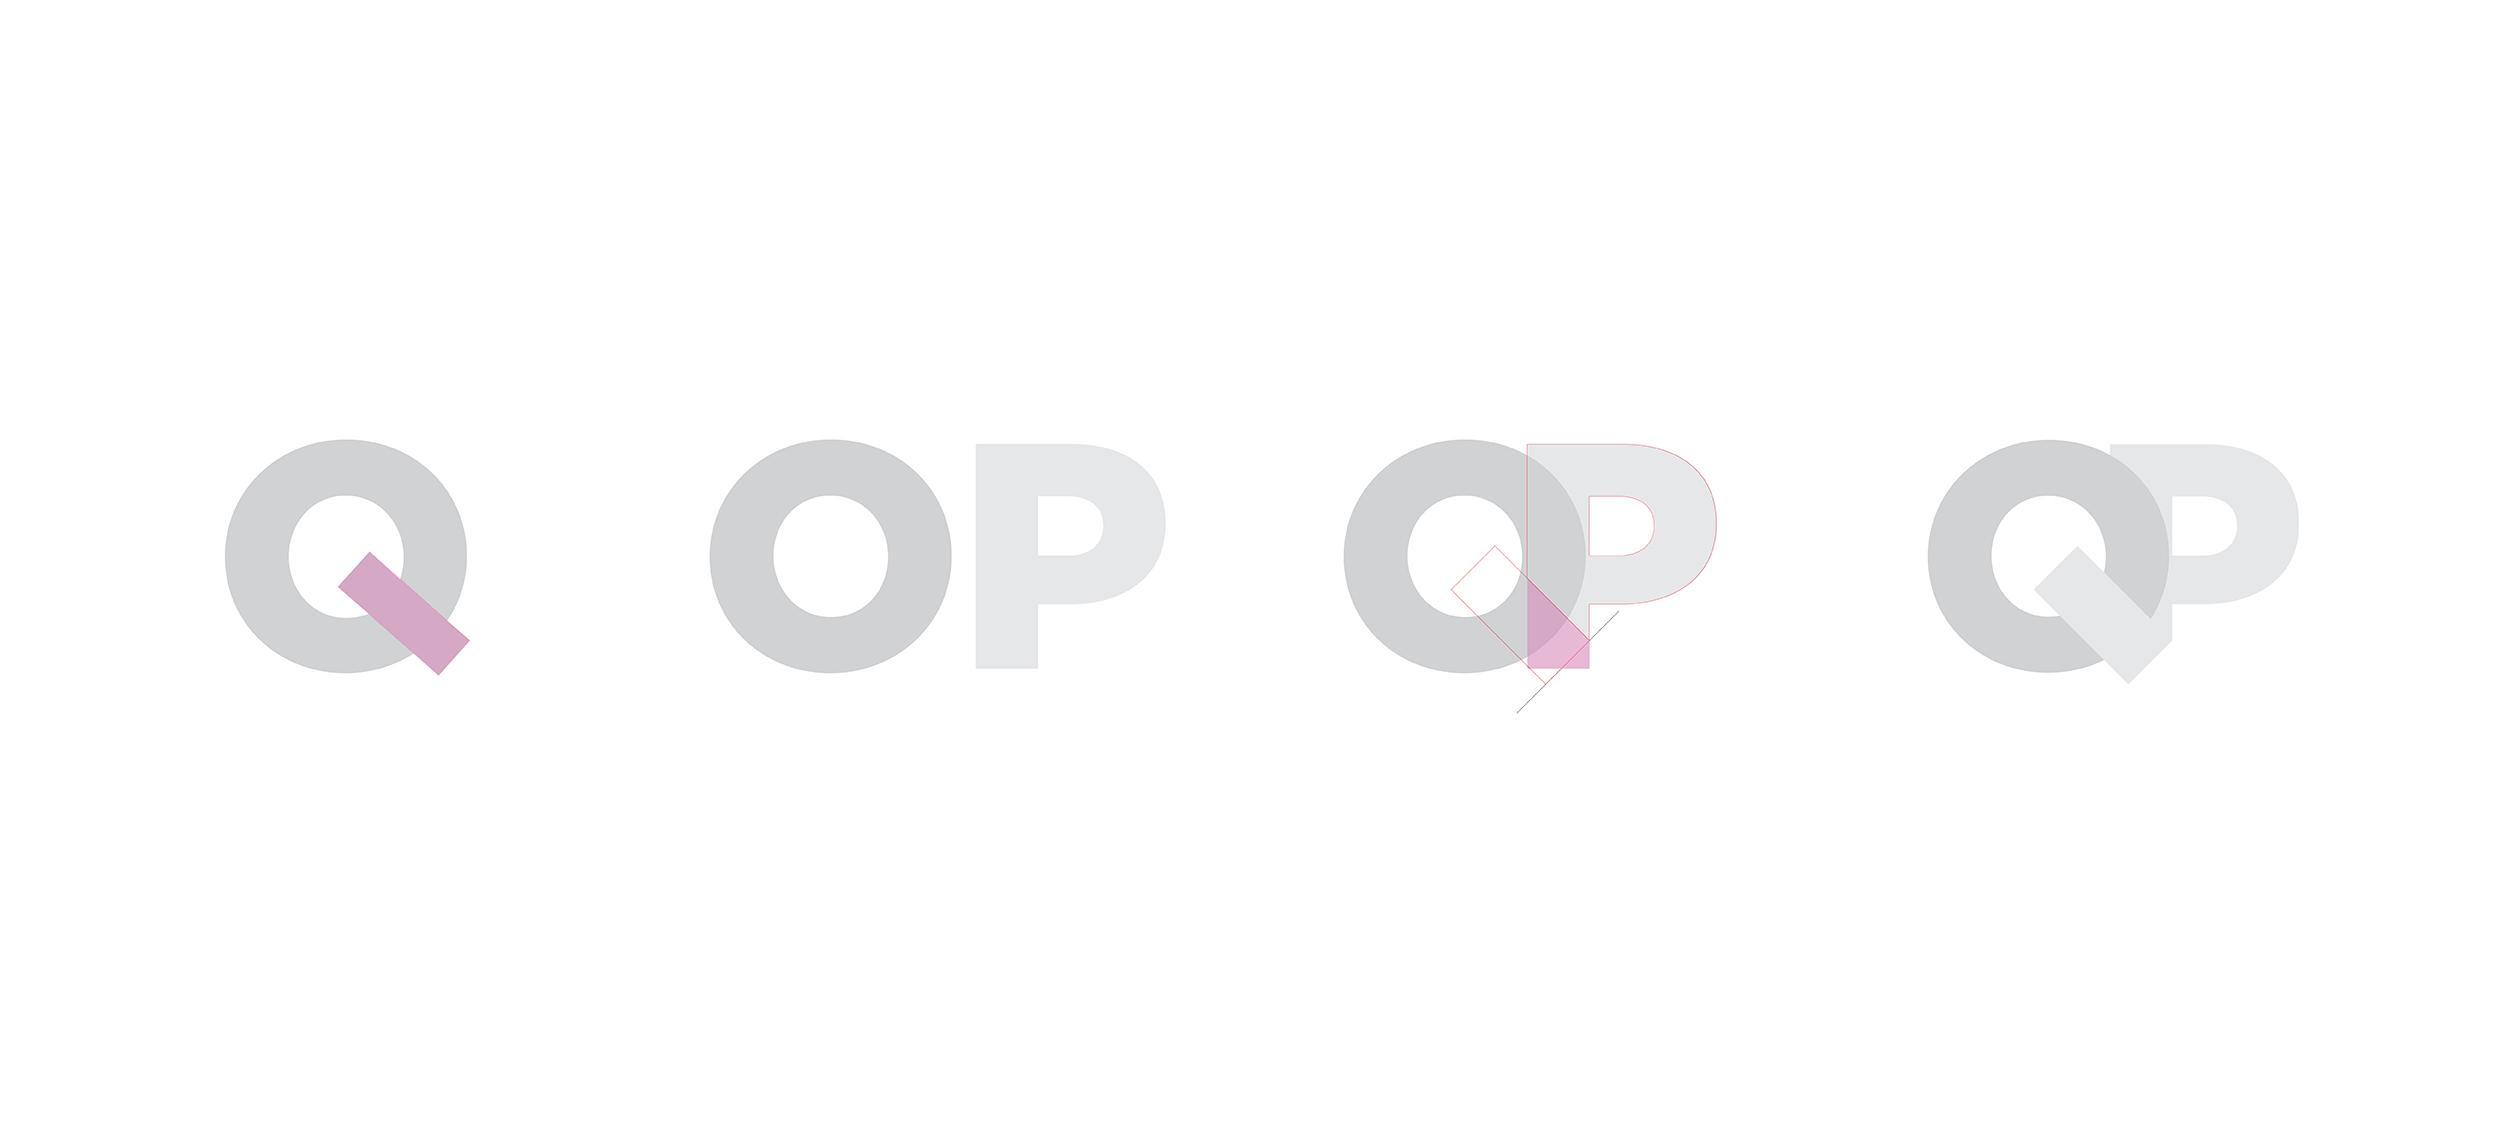 behance portf qpromotion v2.0-04.jpg